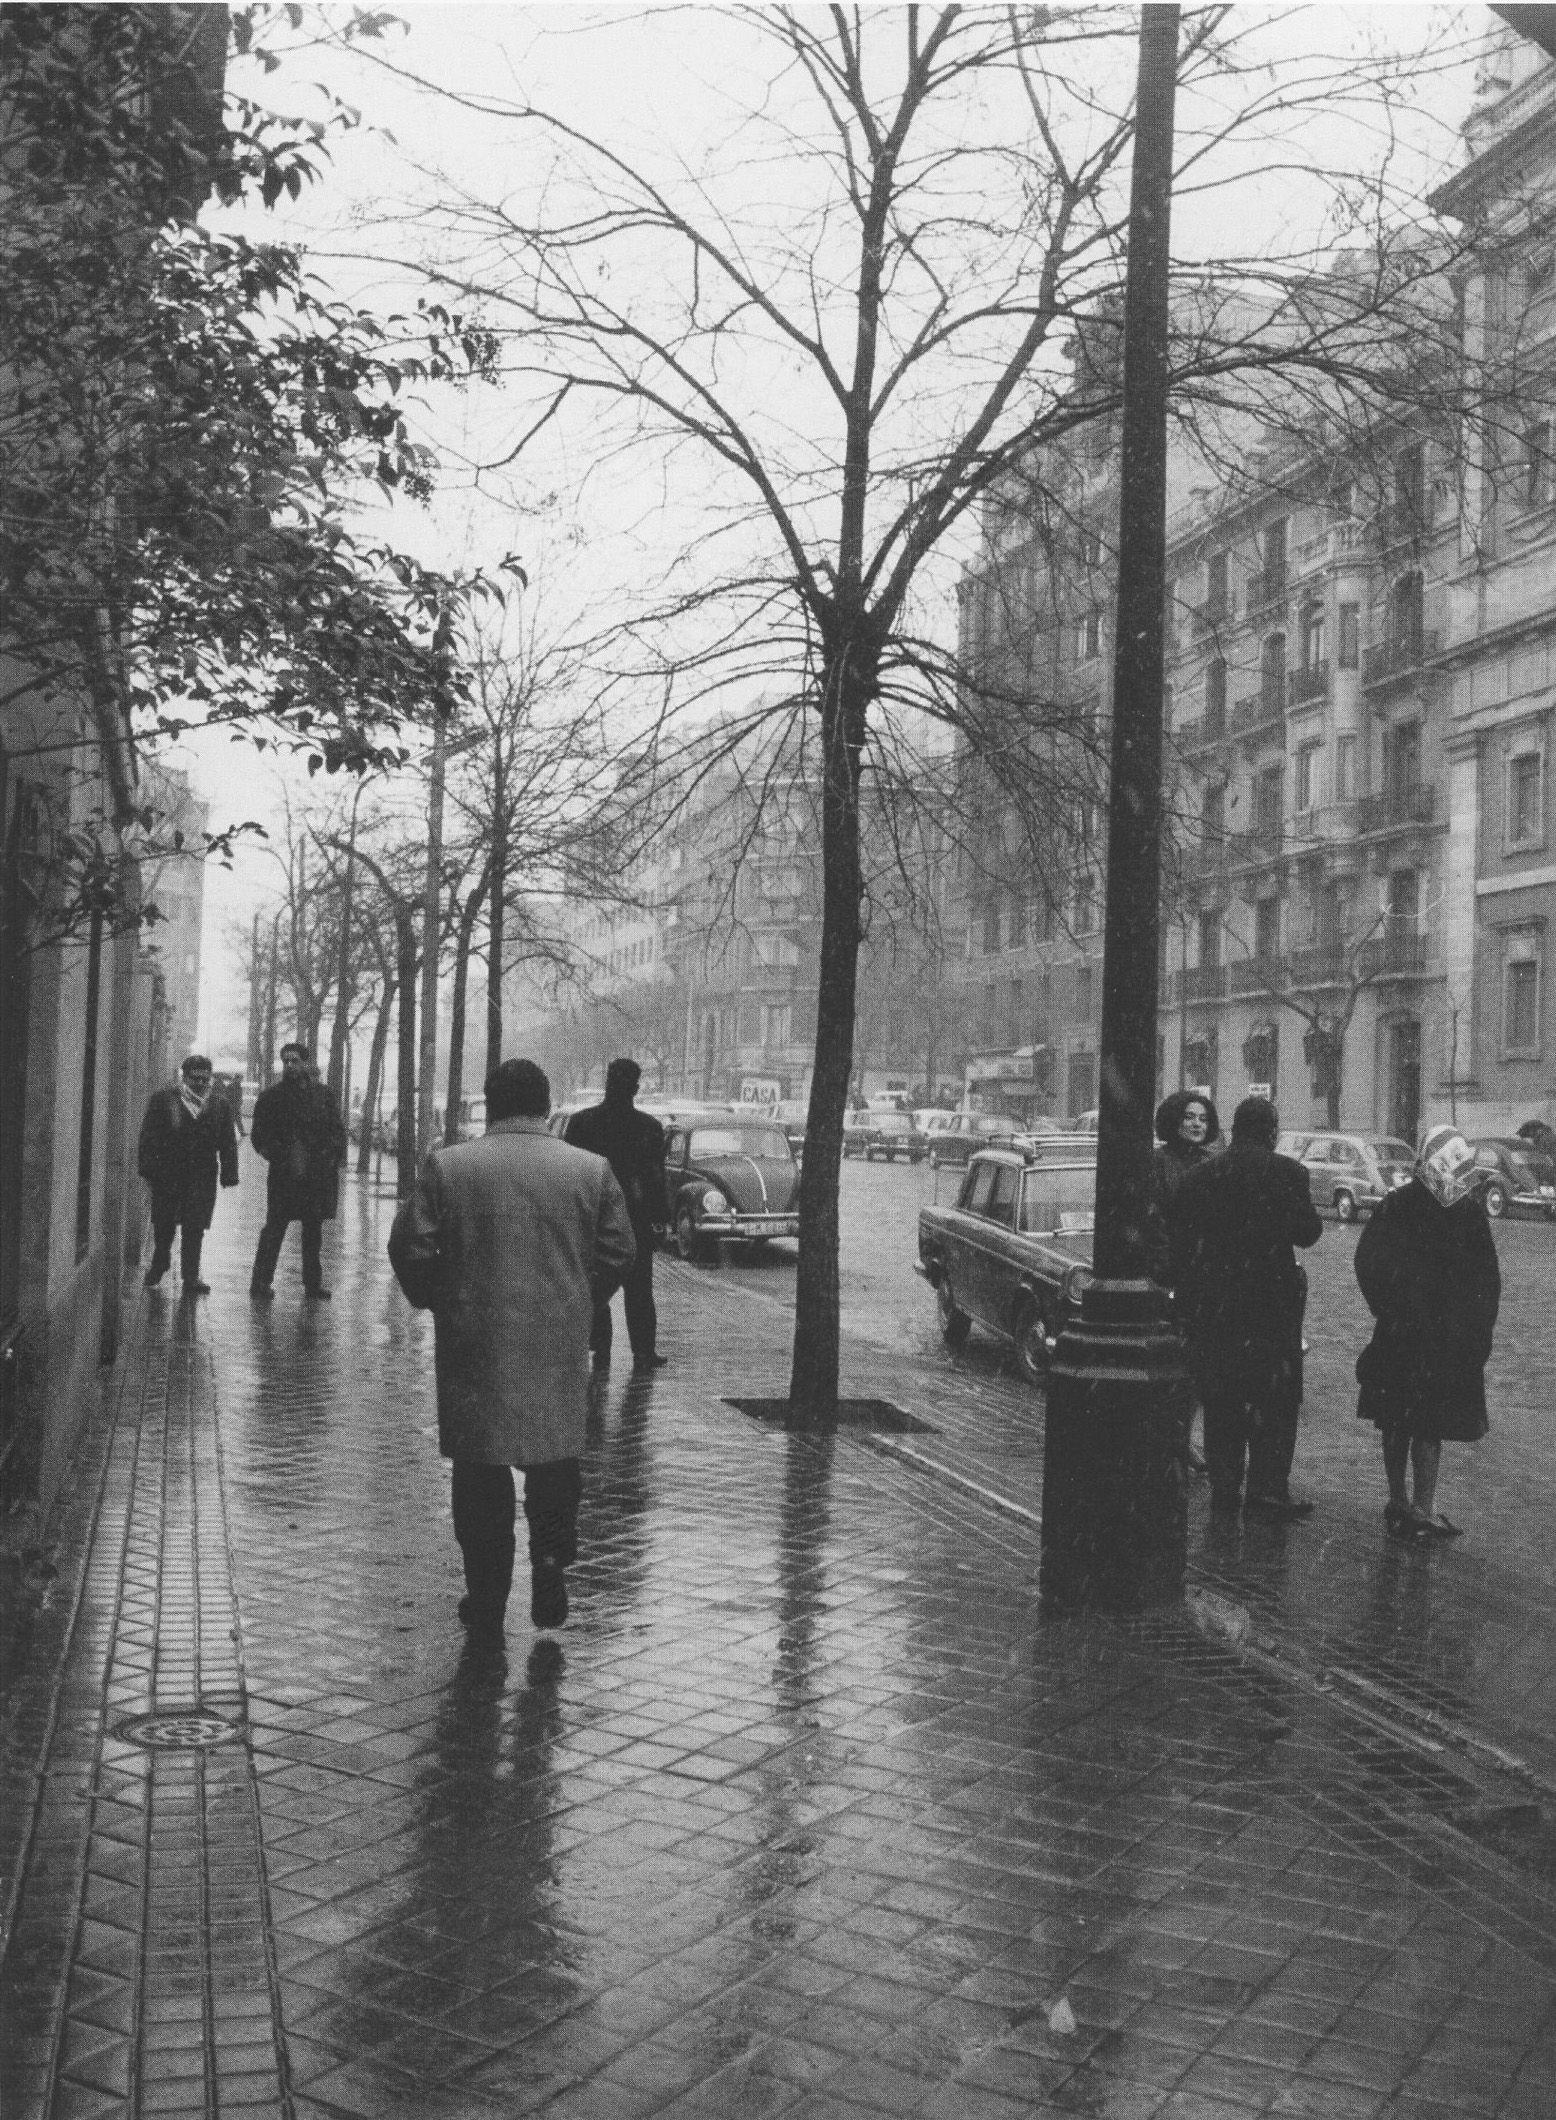 Madrid 1965 calle serrano madrid antiguo old - Calle serrano 55 madrid ...